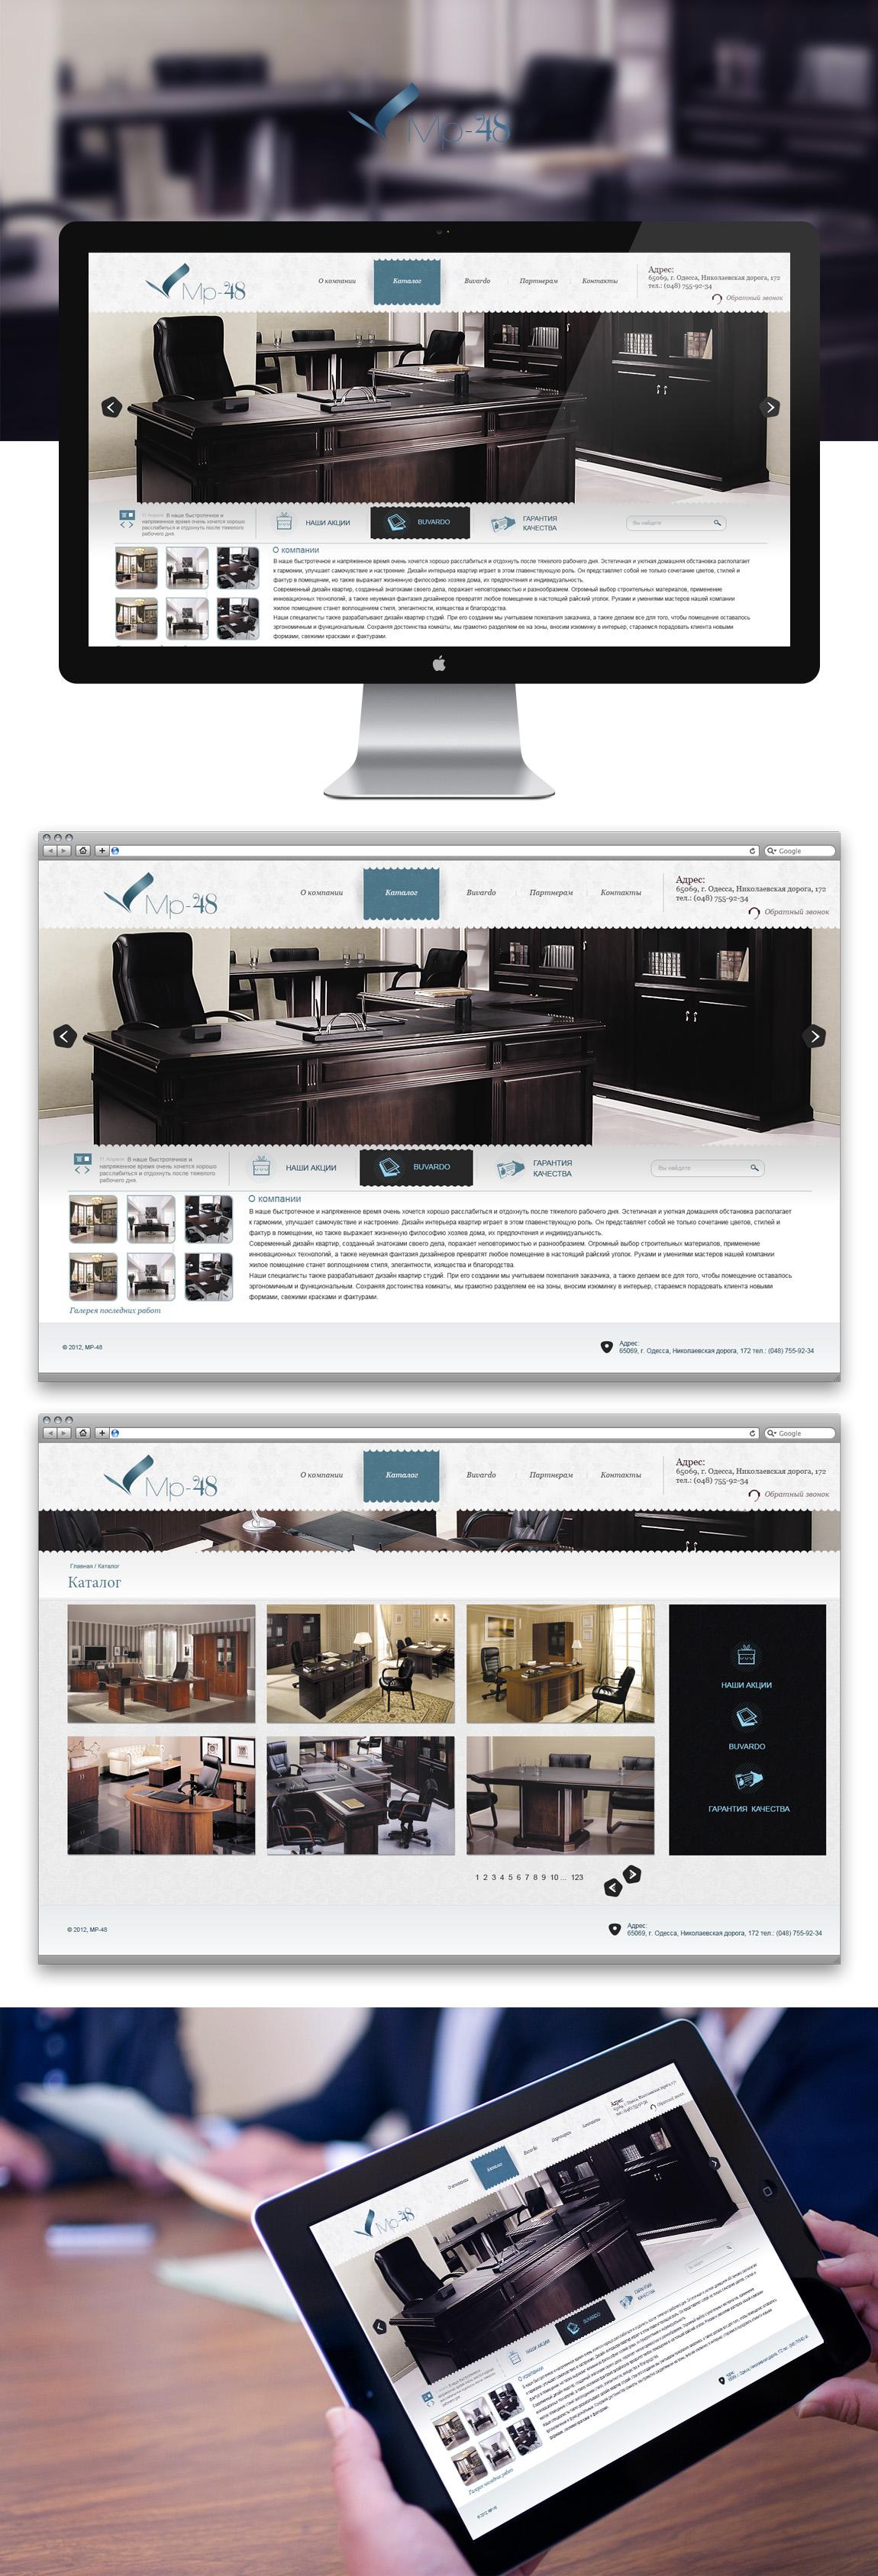 МП-48 интернет каталог мебели.